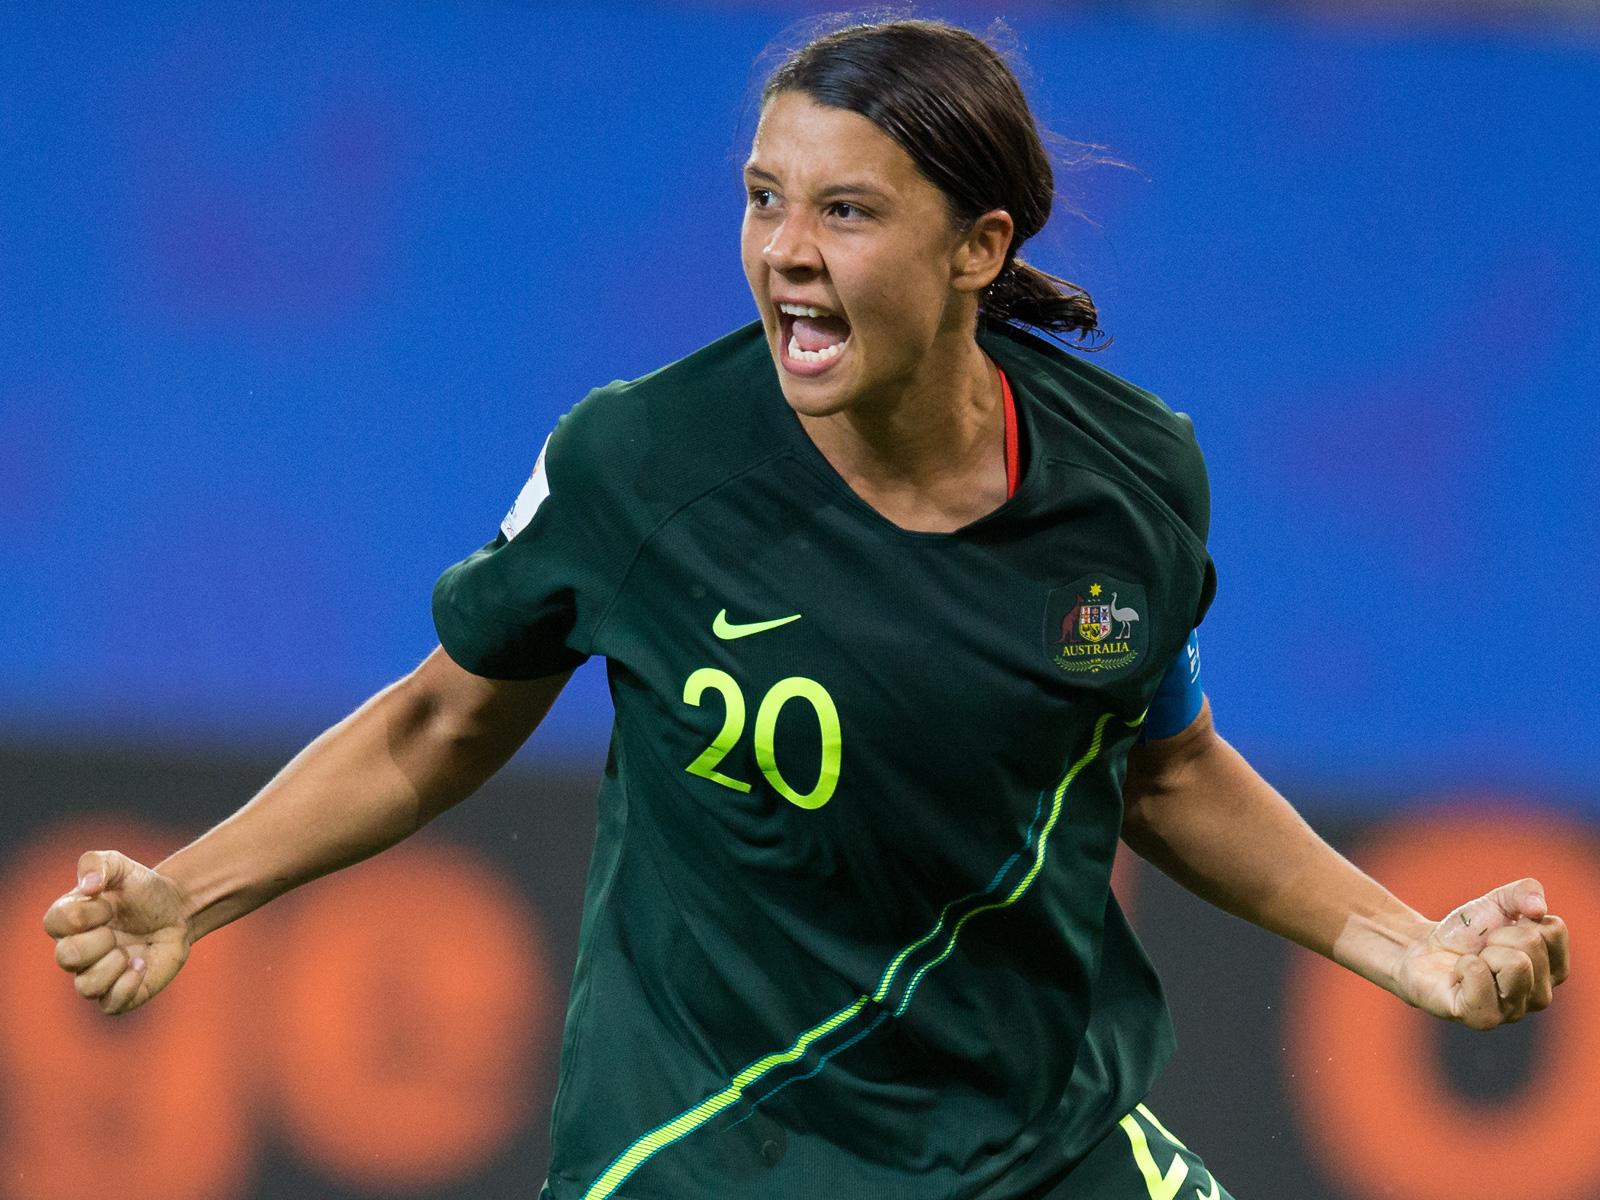 Sam Kerr leads Australia's Women's World Cup team